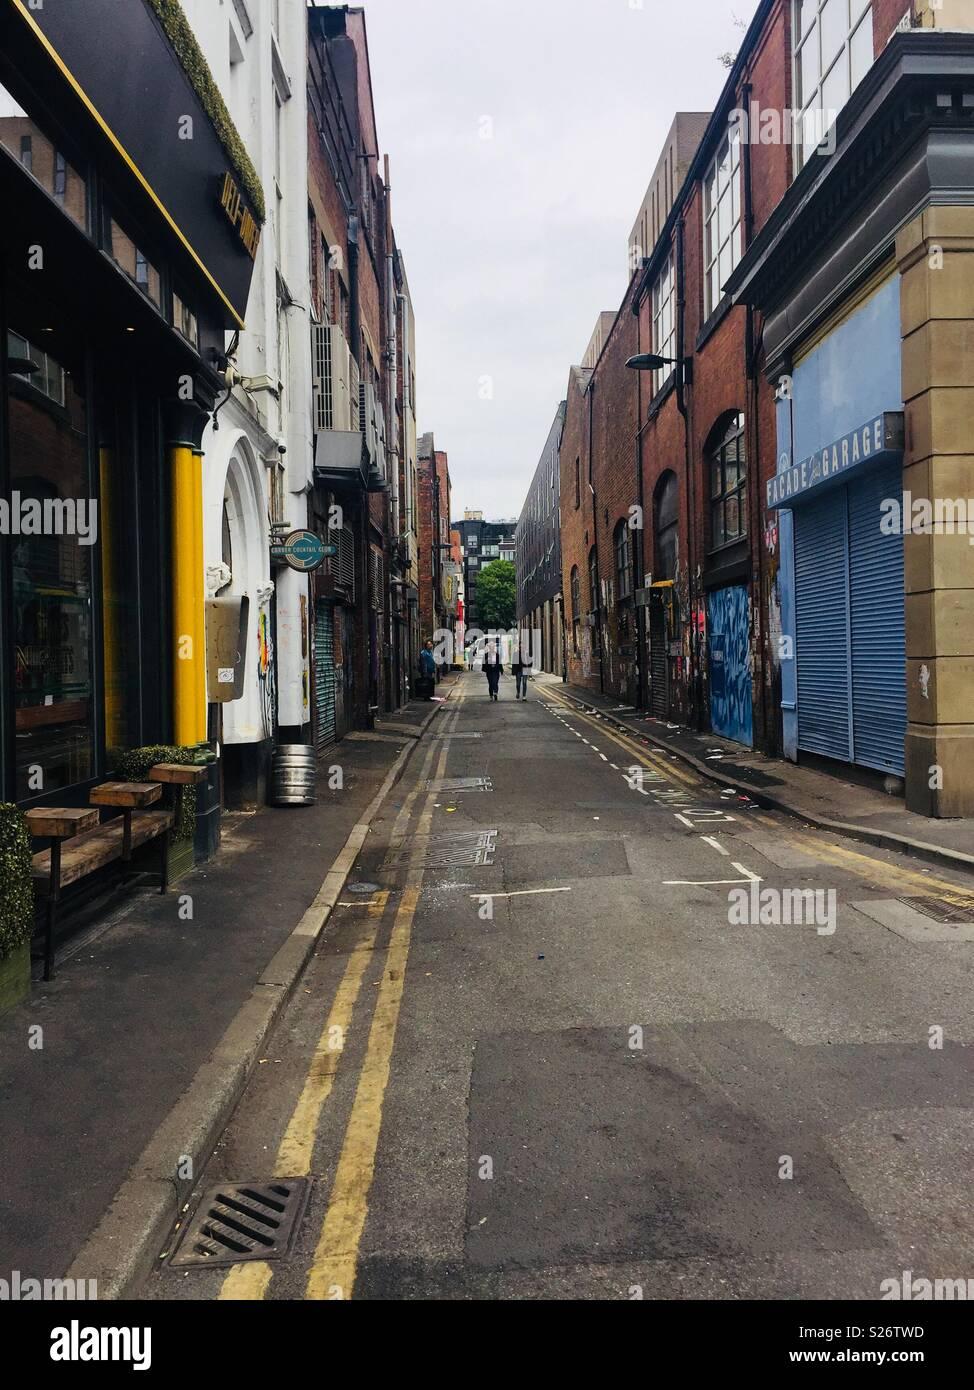 Spear Street, Manchester - Stock Image